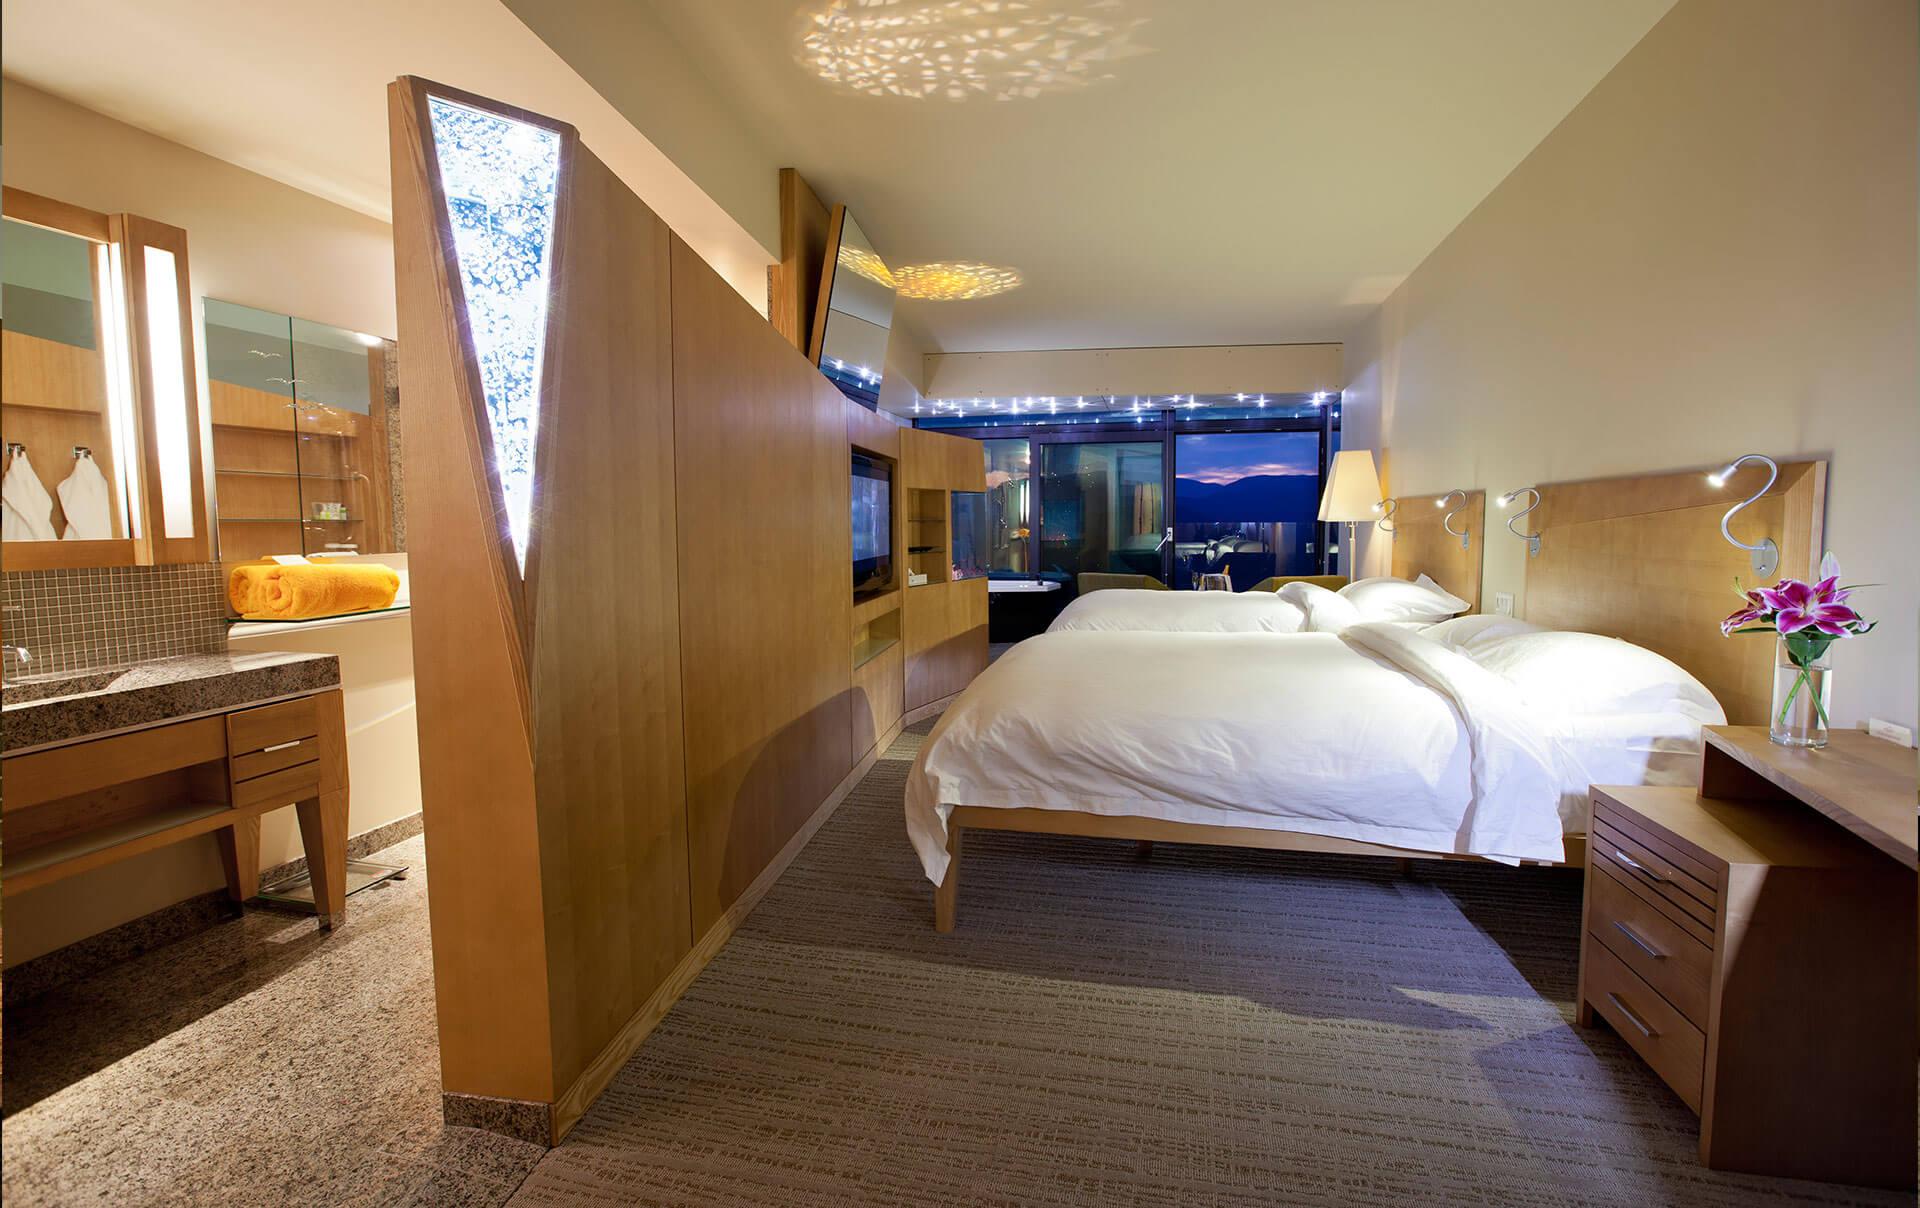 Lake View Room 2 Queen Beds